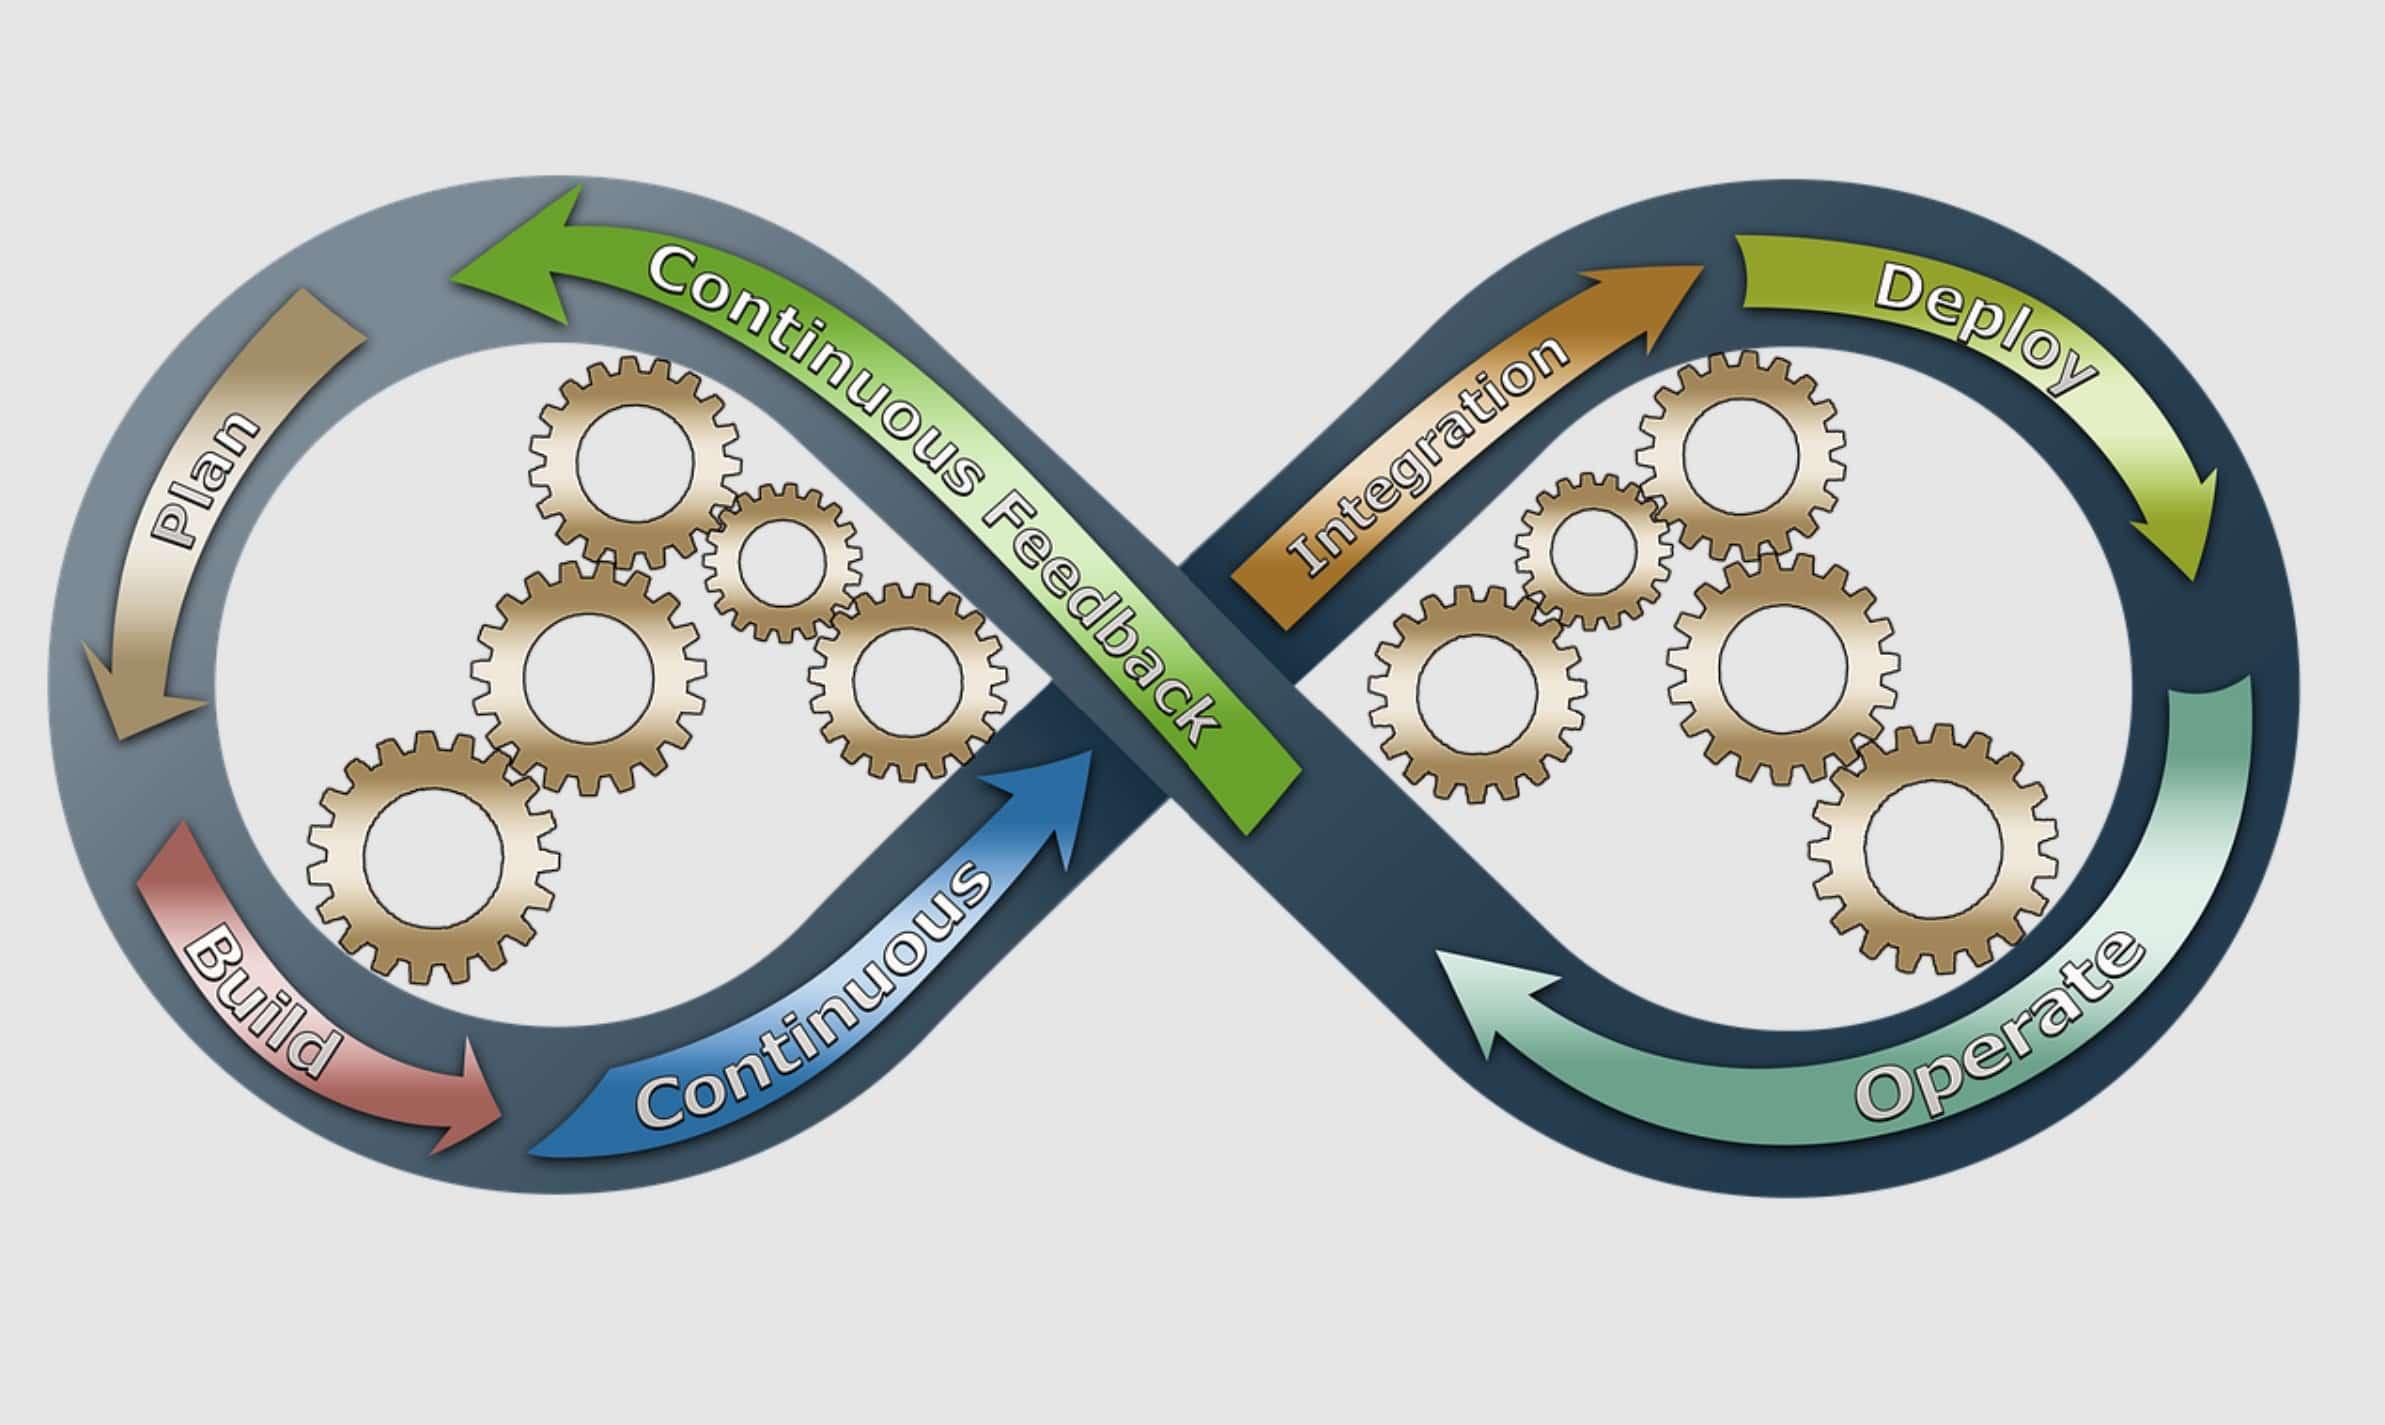 custom software development benefits1